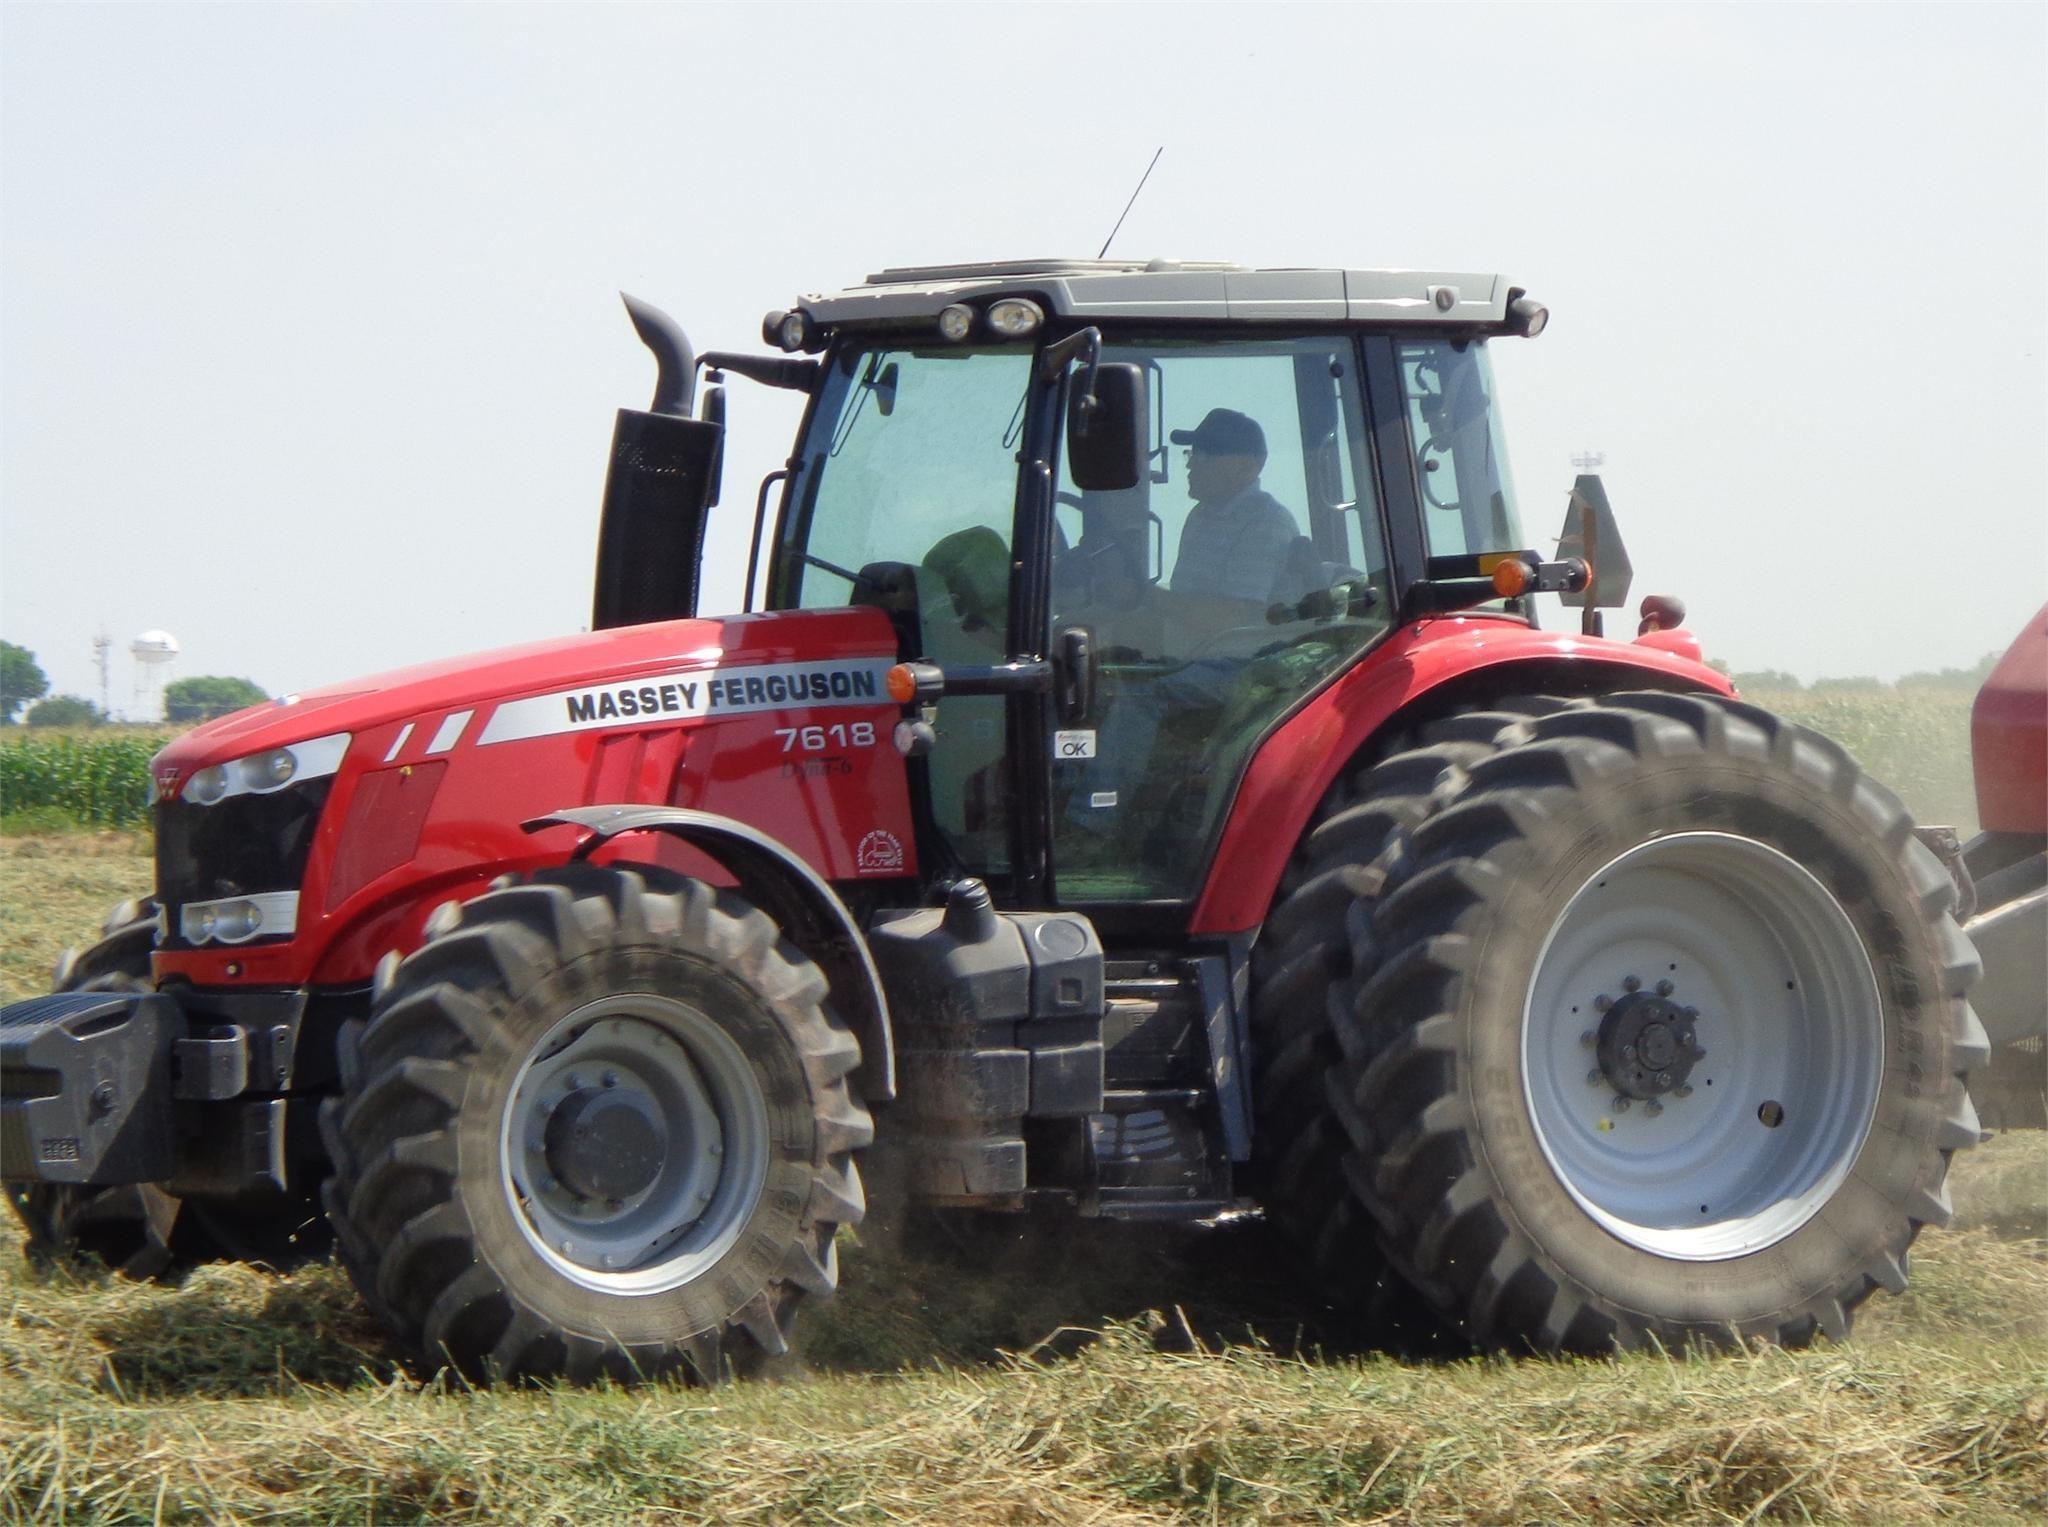 2013 Massey Ferguson 7618 Tractor